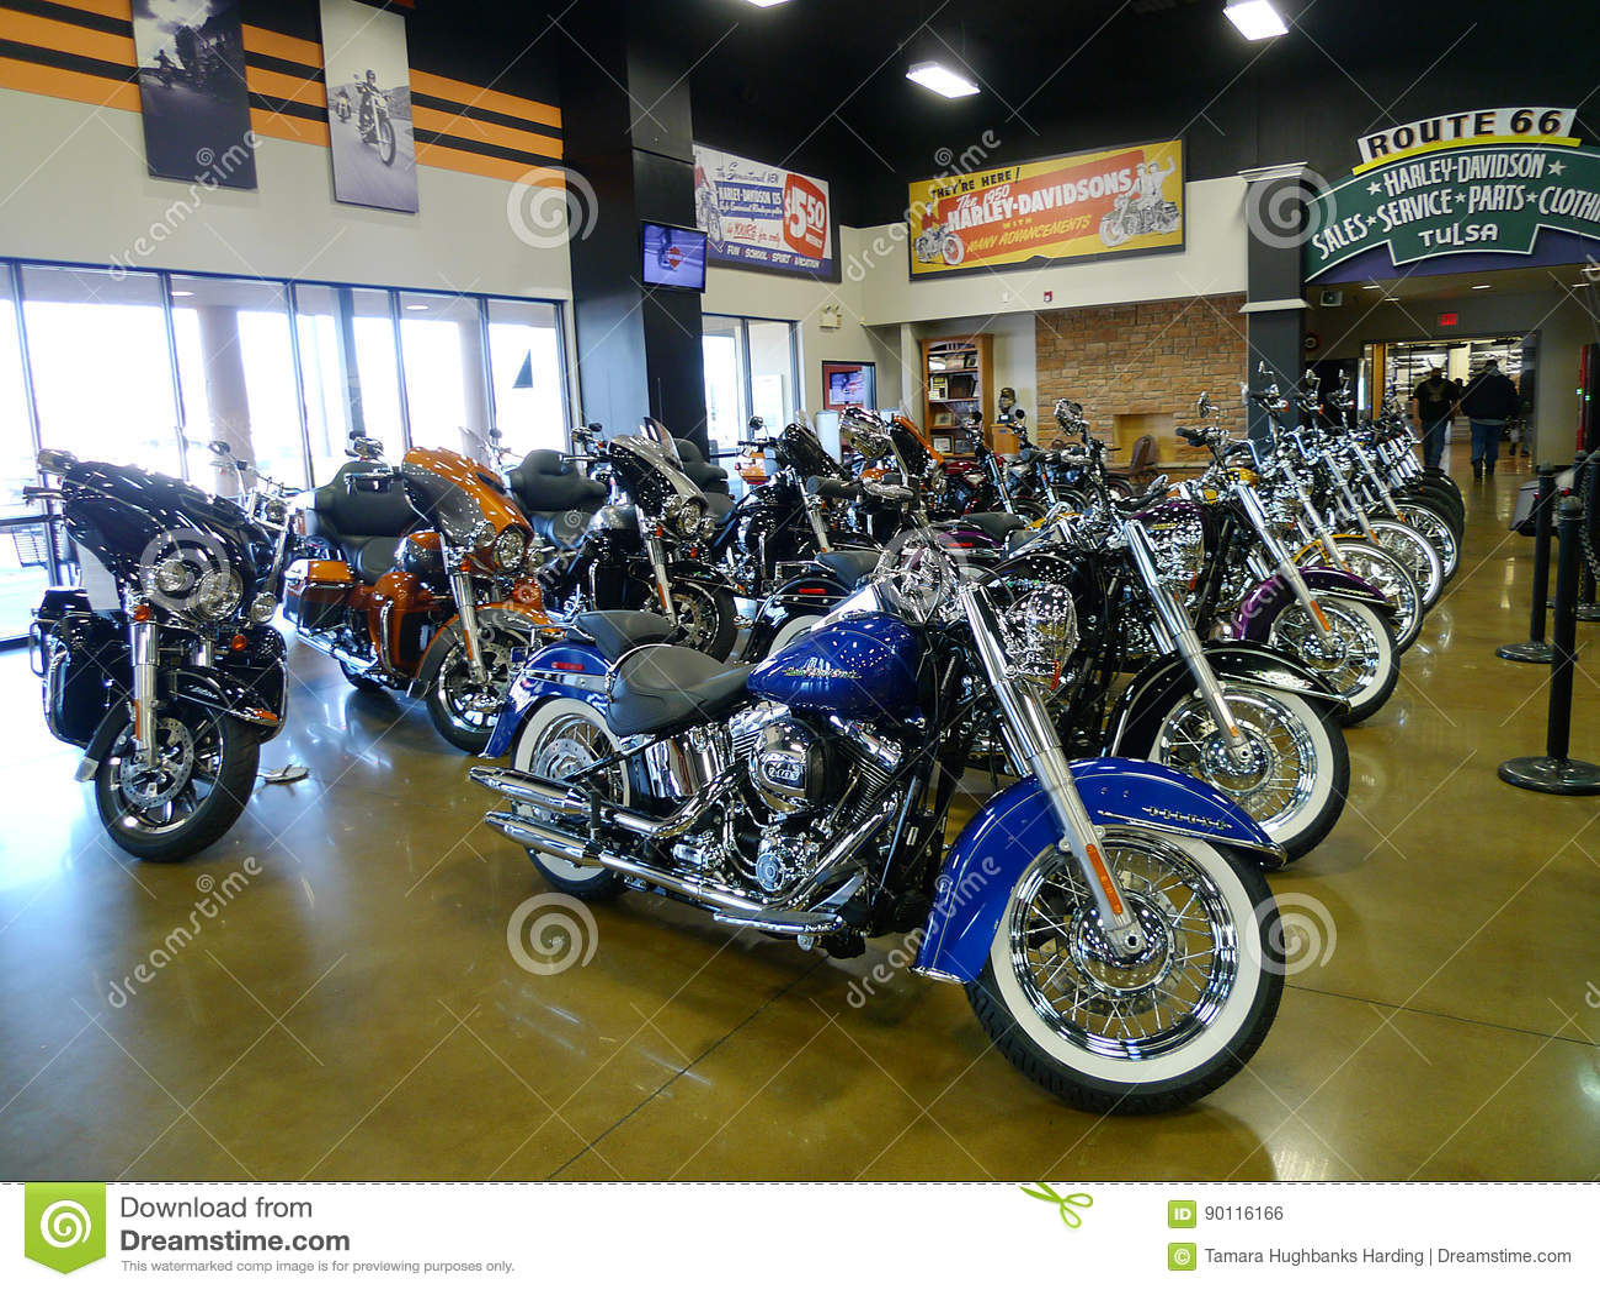 Route 66 Harley Davidson In Tulsa, Oklahoma, New Bikes Editorial